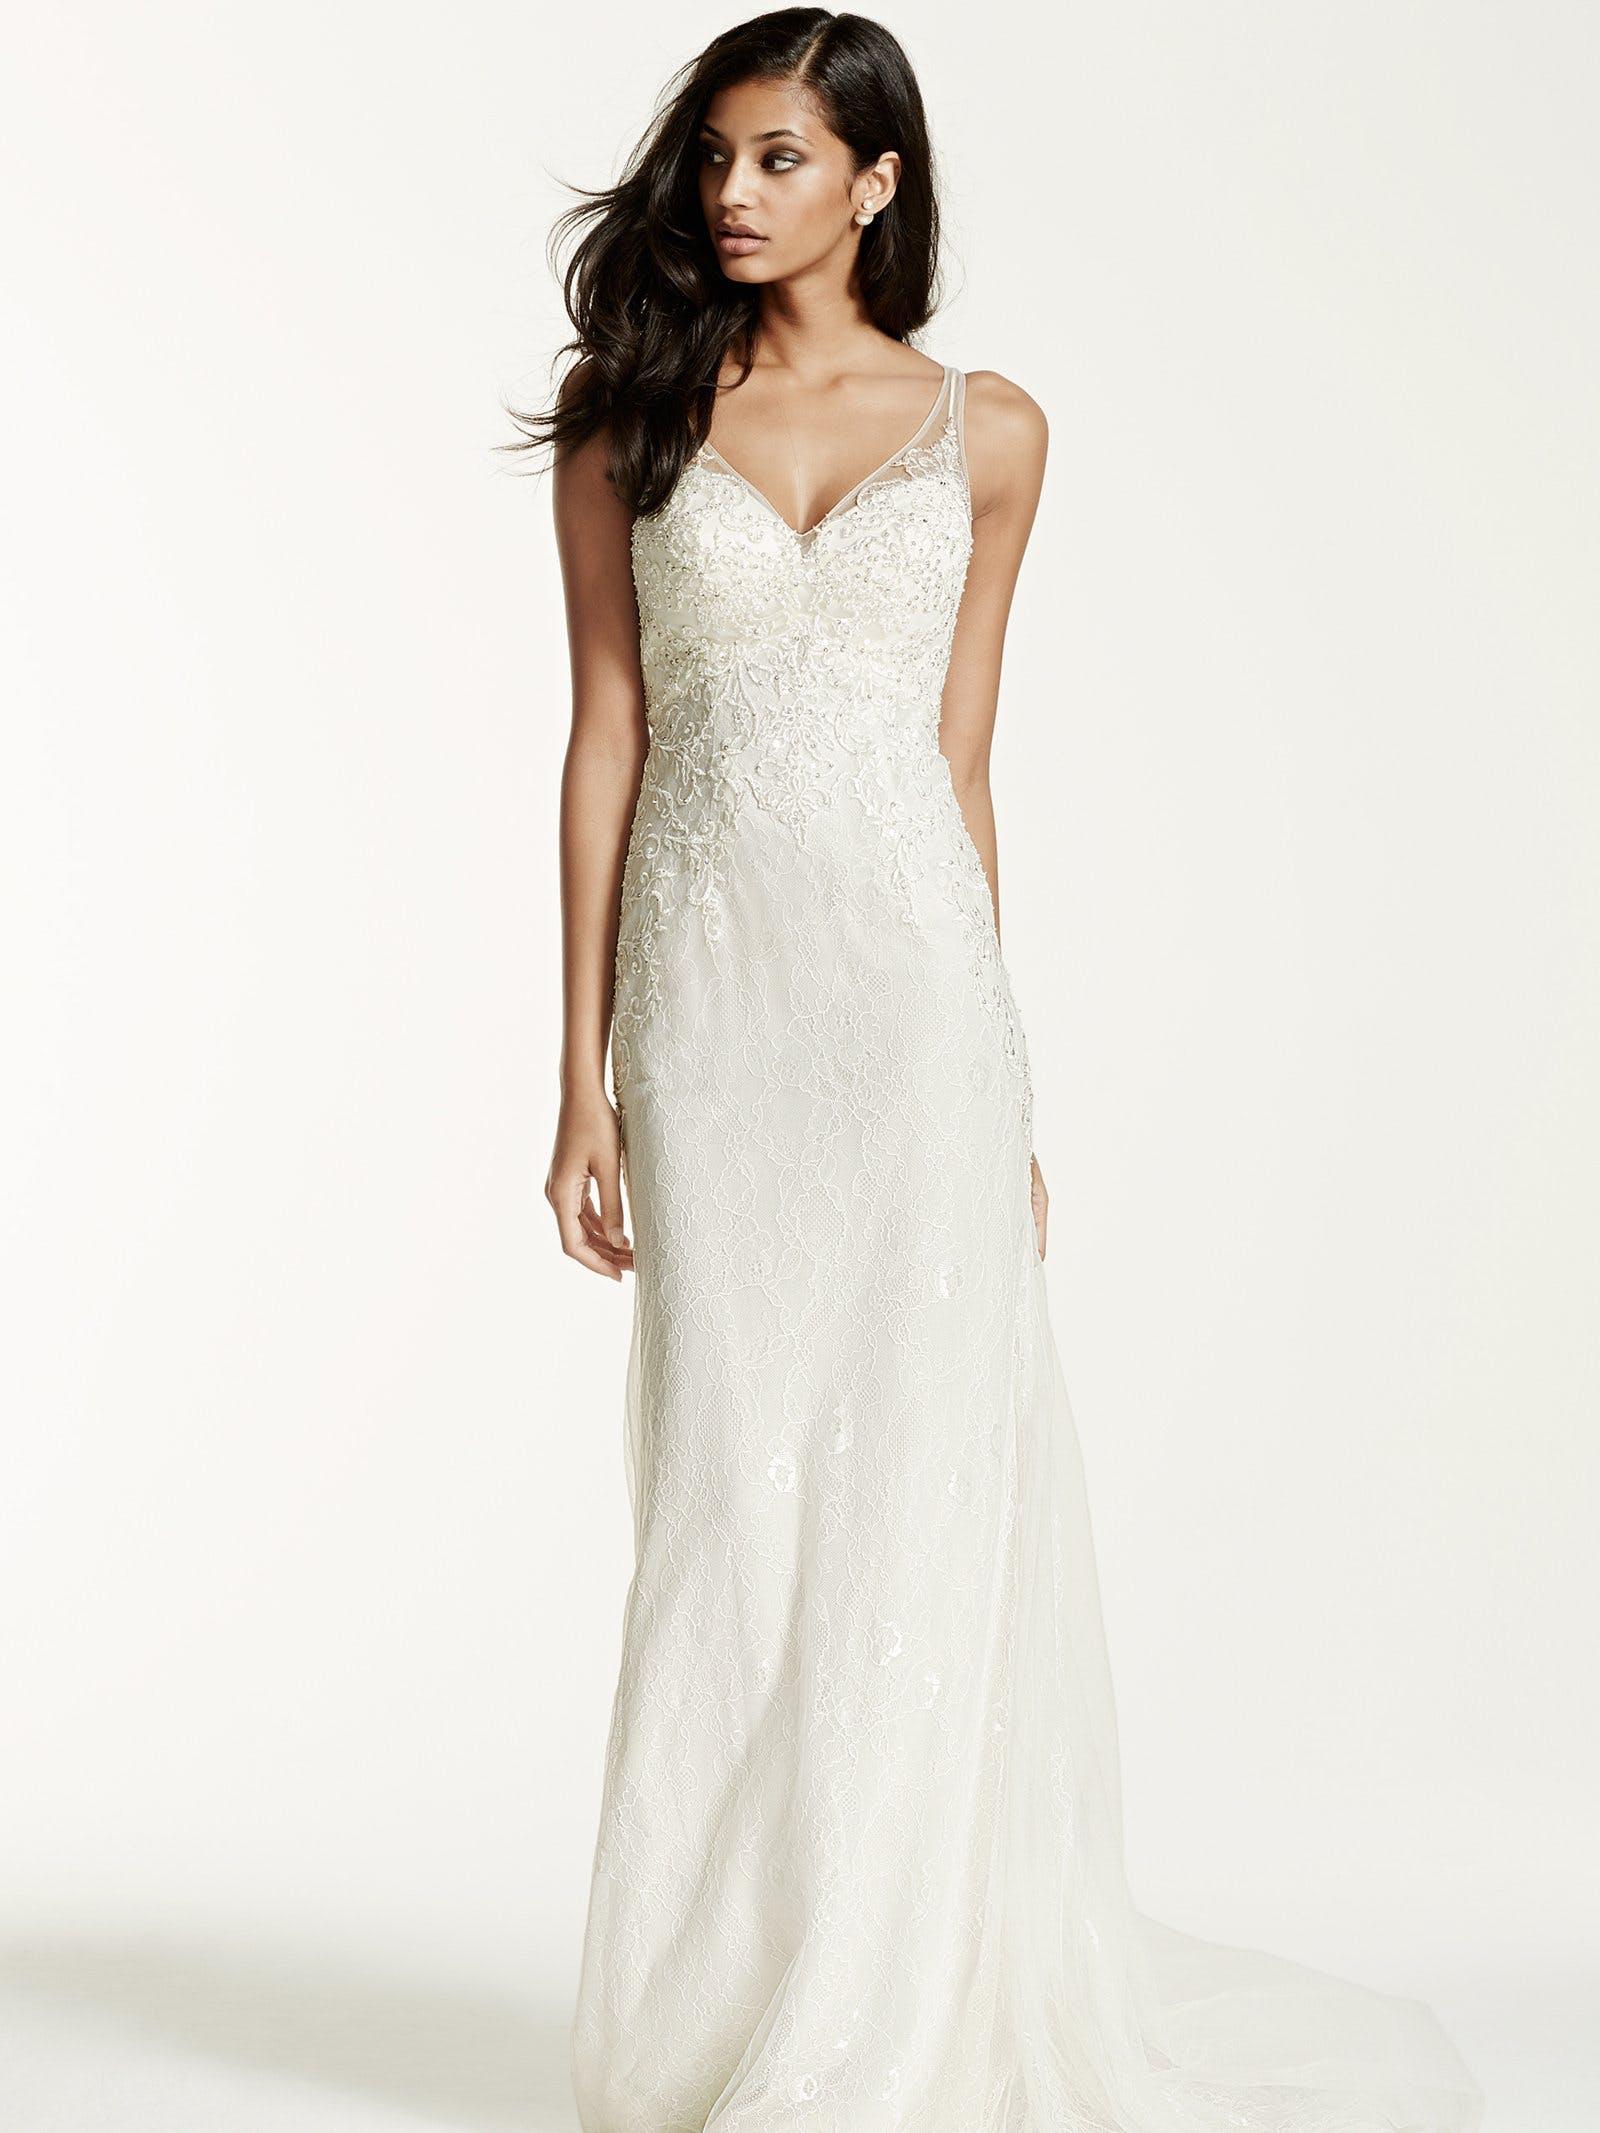 galina wedding dresses photo - 1